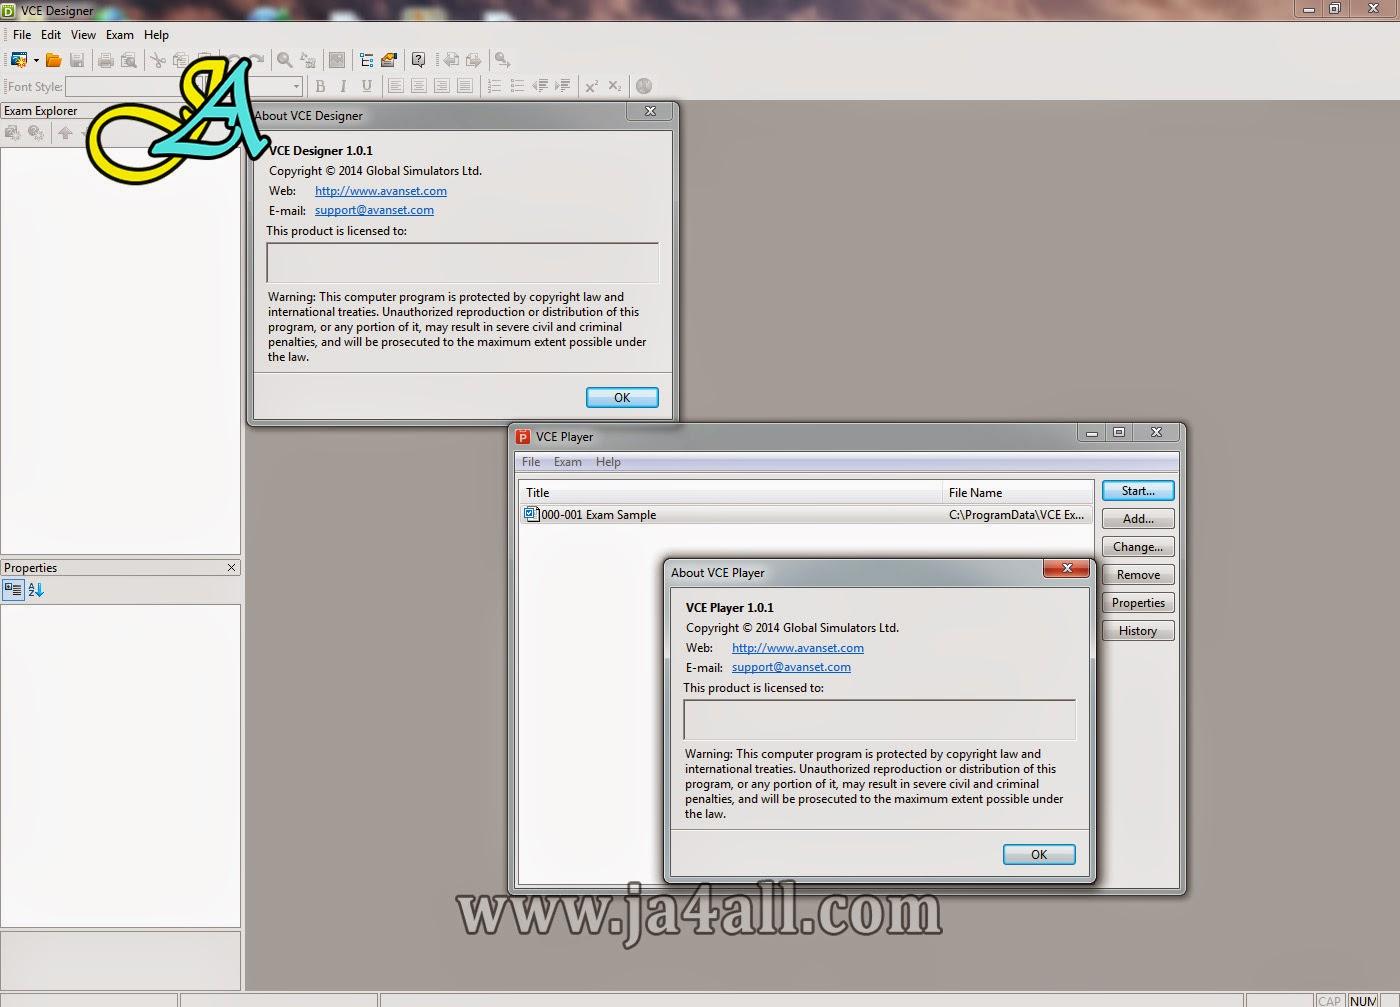 Avanset VCE Exam Simulators 1.0.1 Full Version